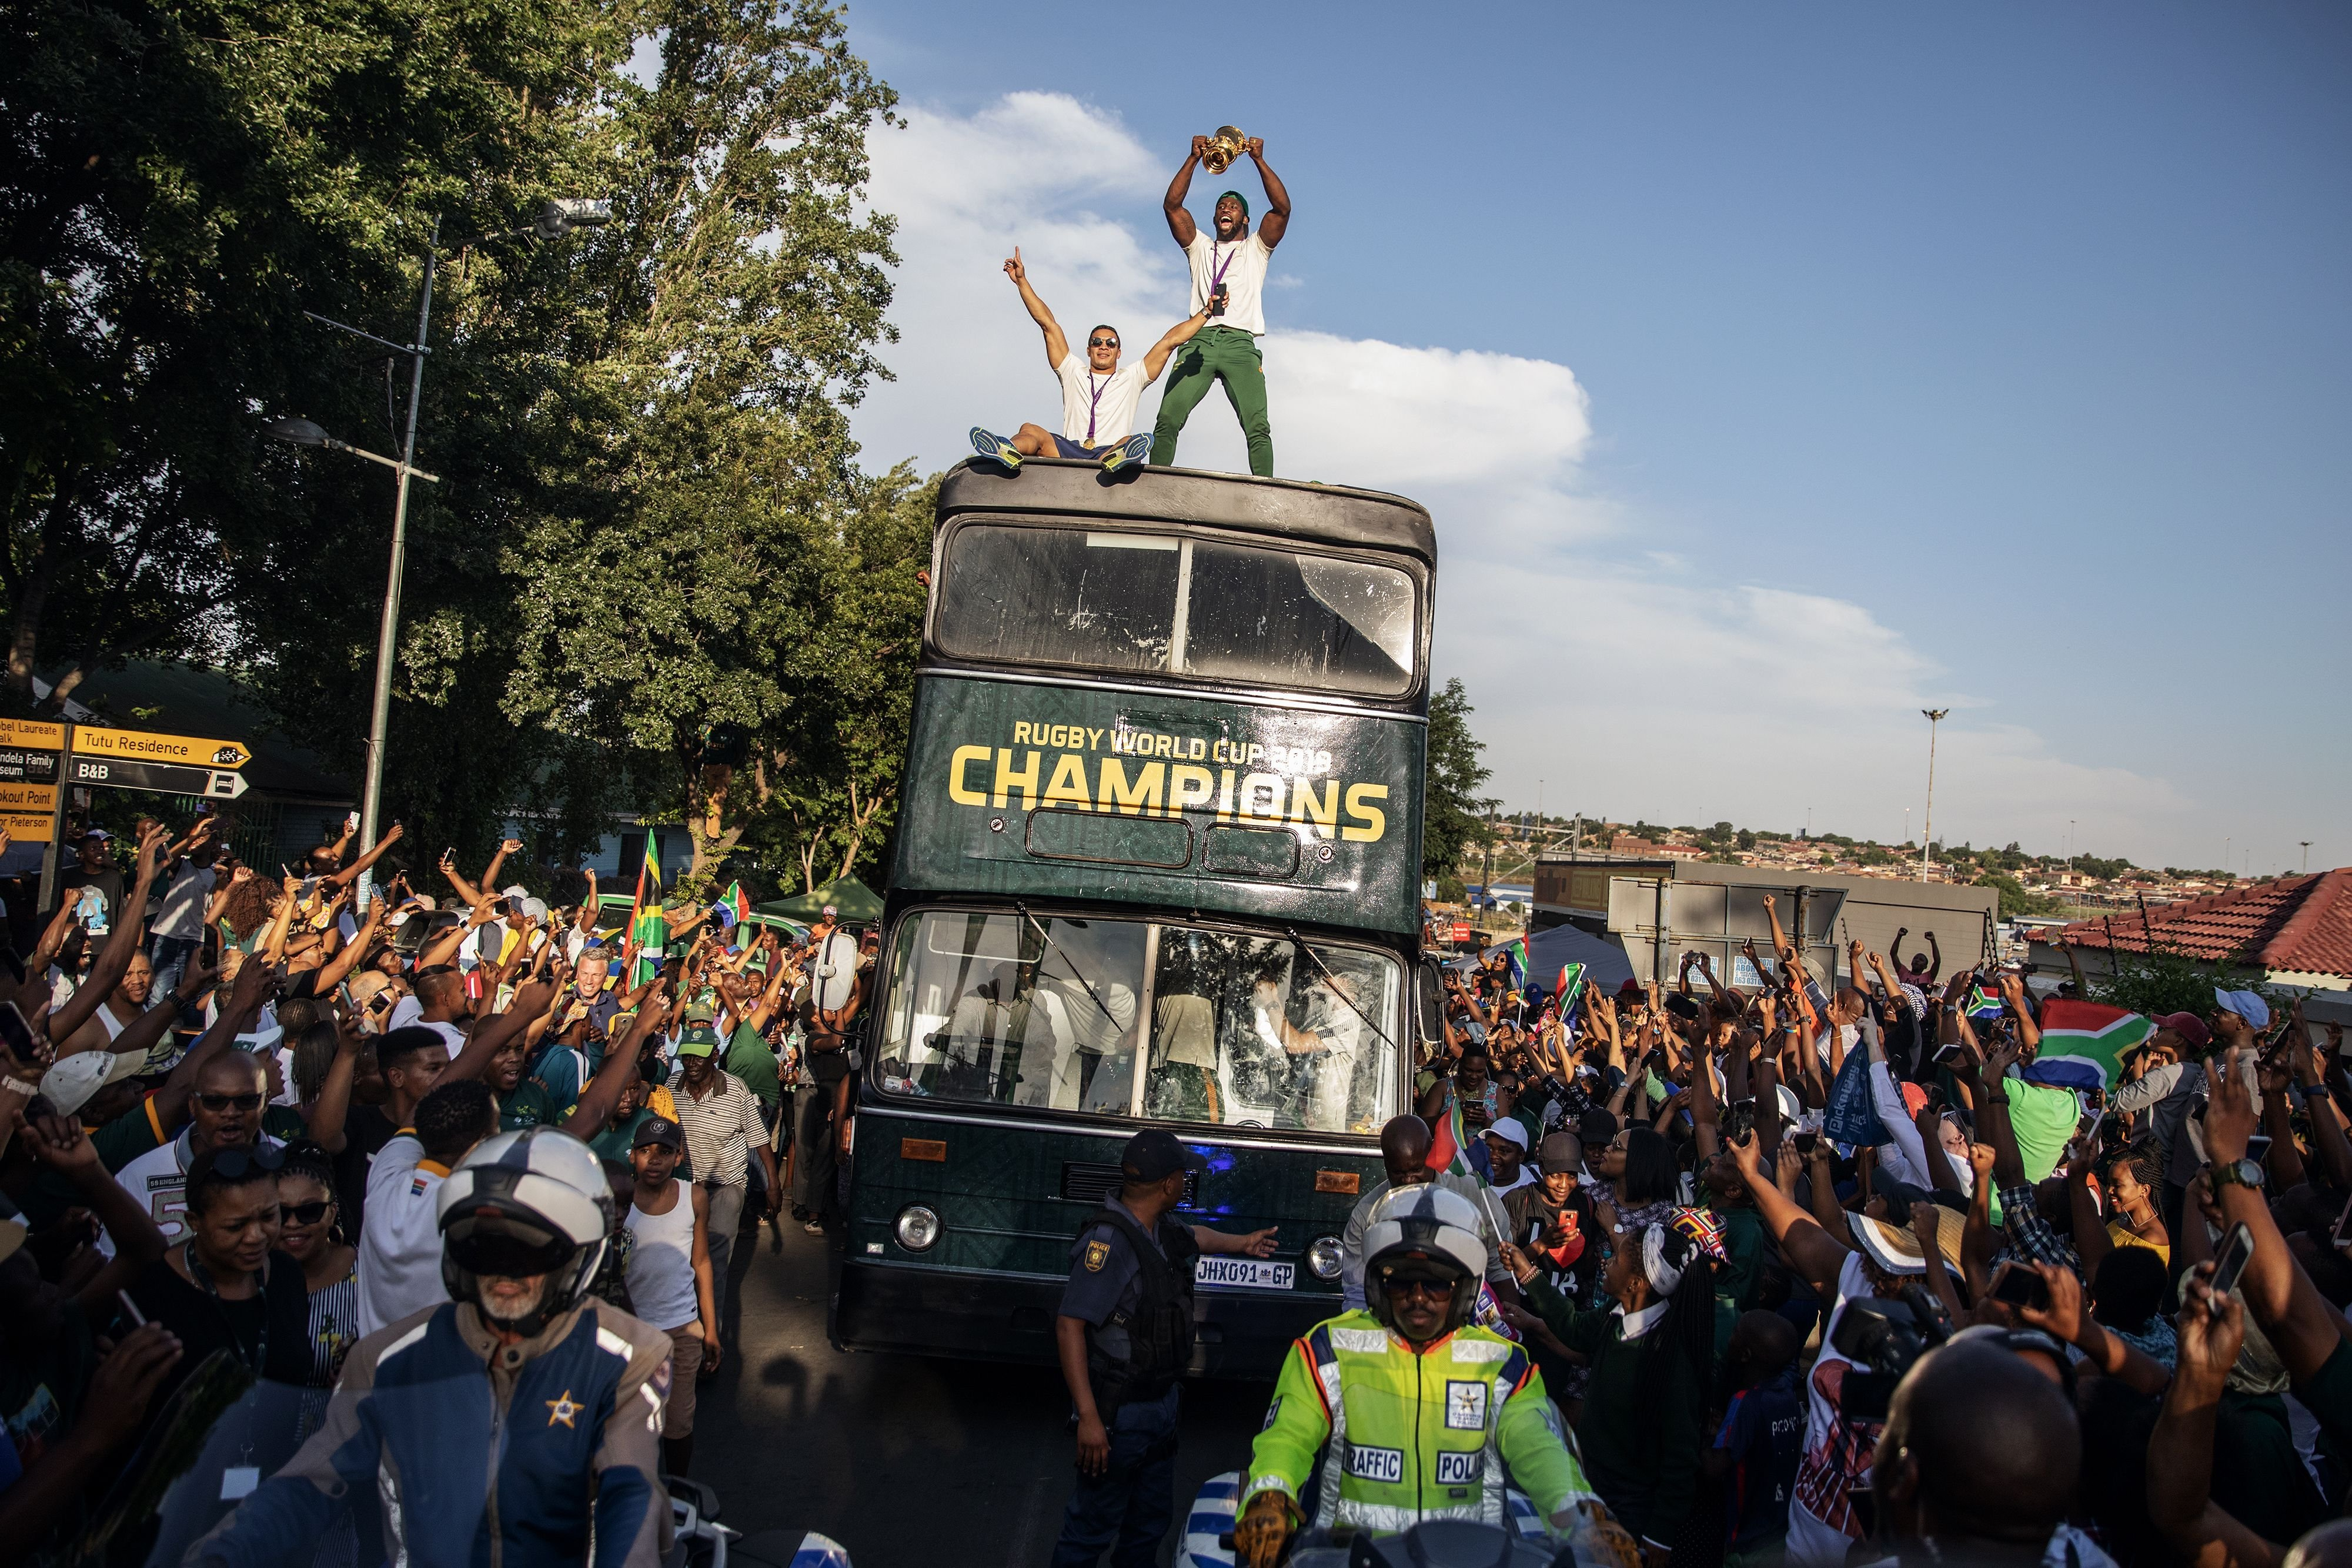 Springboks' victory parade brings joy across South Africa